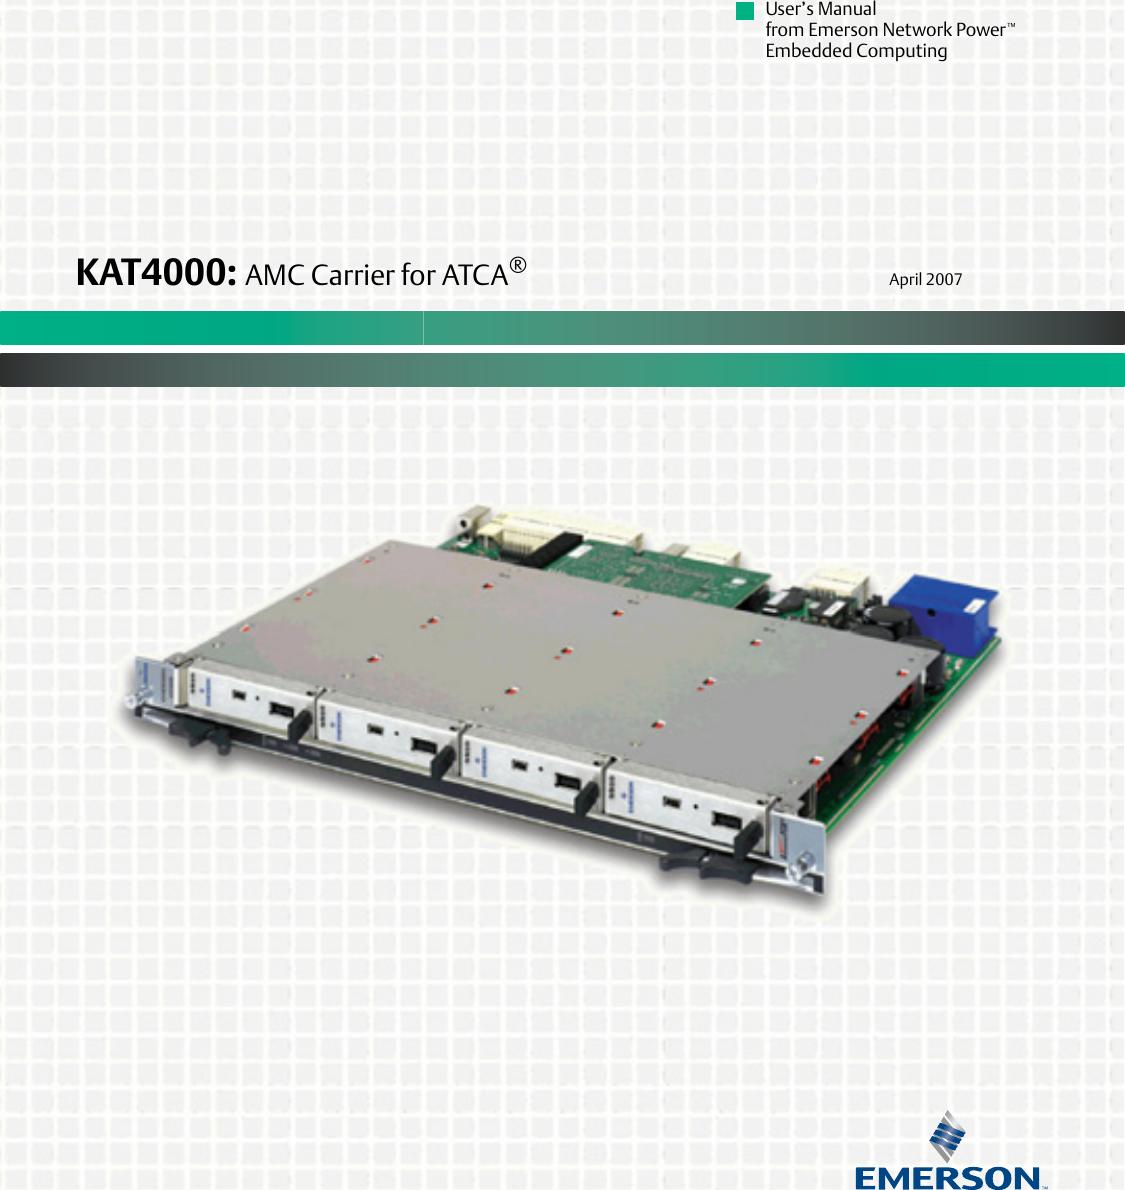 ABIT BE7-G ONBOARD LAN BROADCOM 10-100-1000 MB DRIVER FOR WINDOWS 8